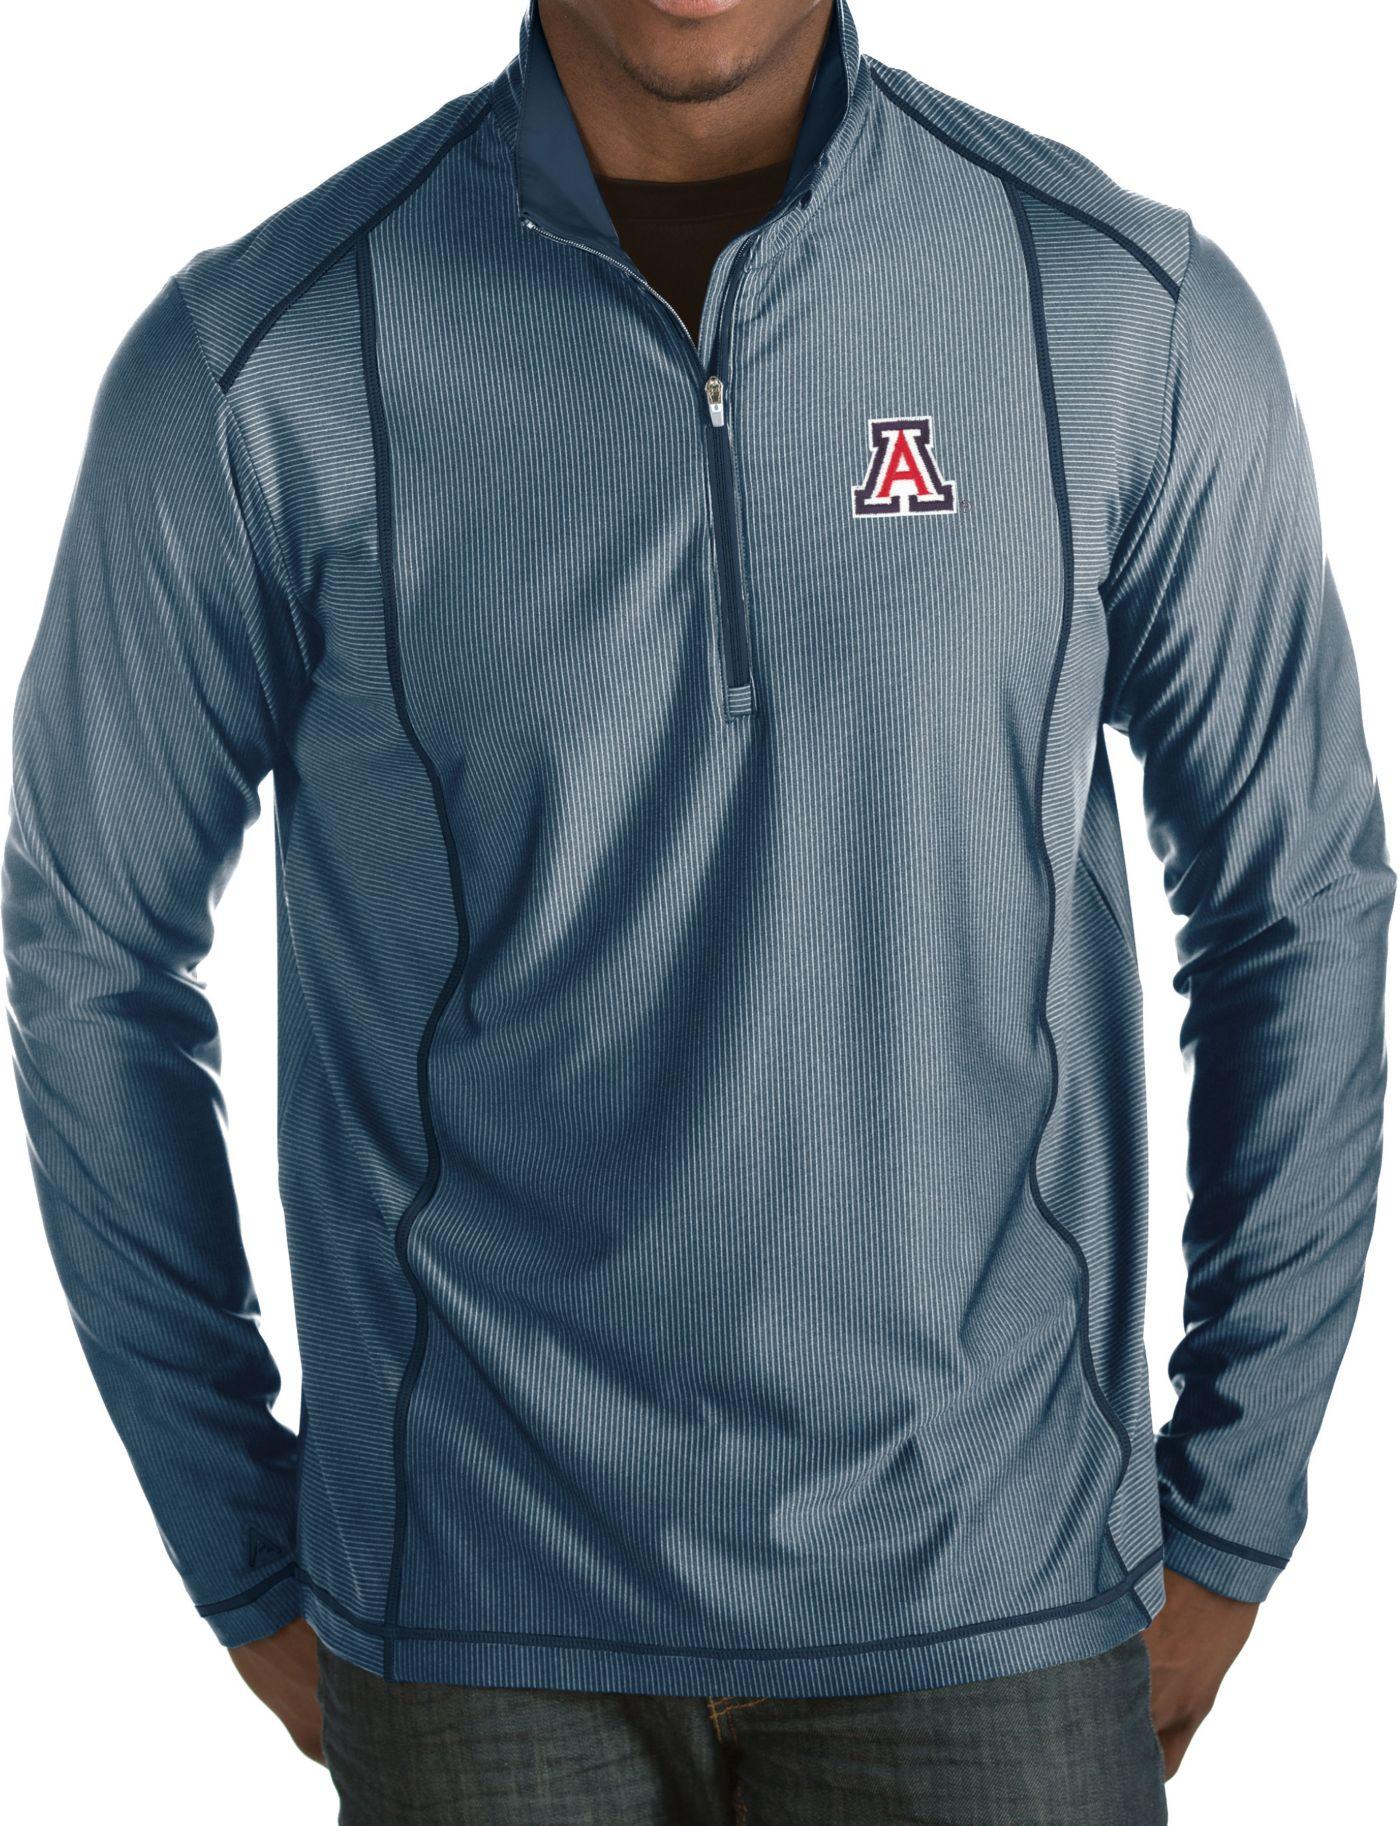 Antigua Men's Arizona Wildcats Navy Tempo Half-Zip Pullover